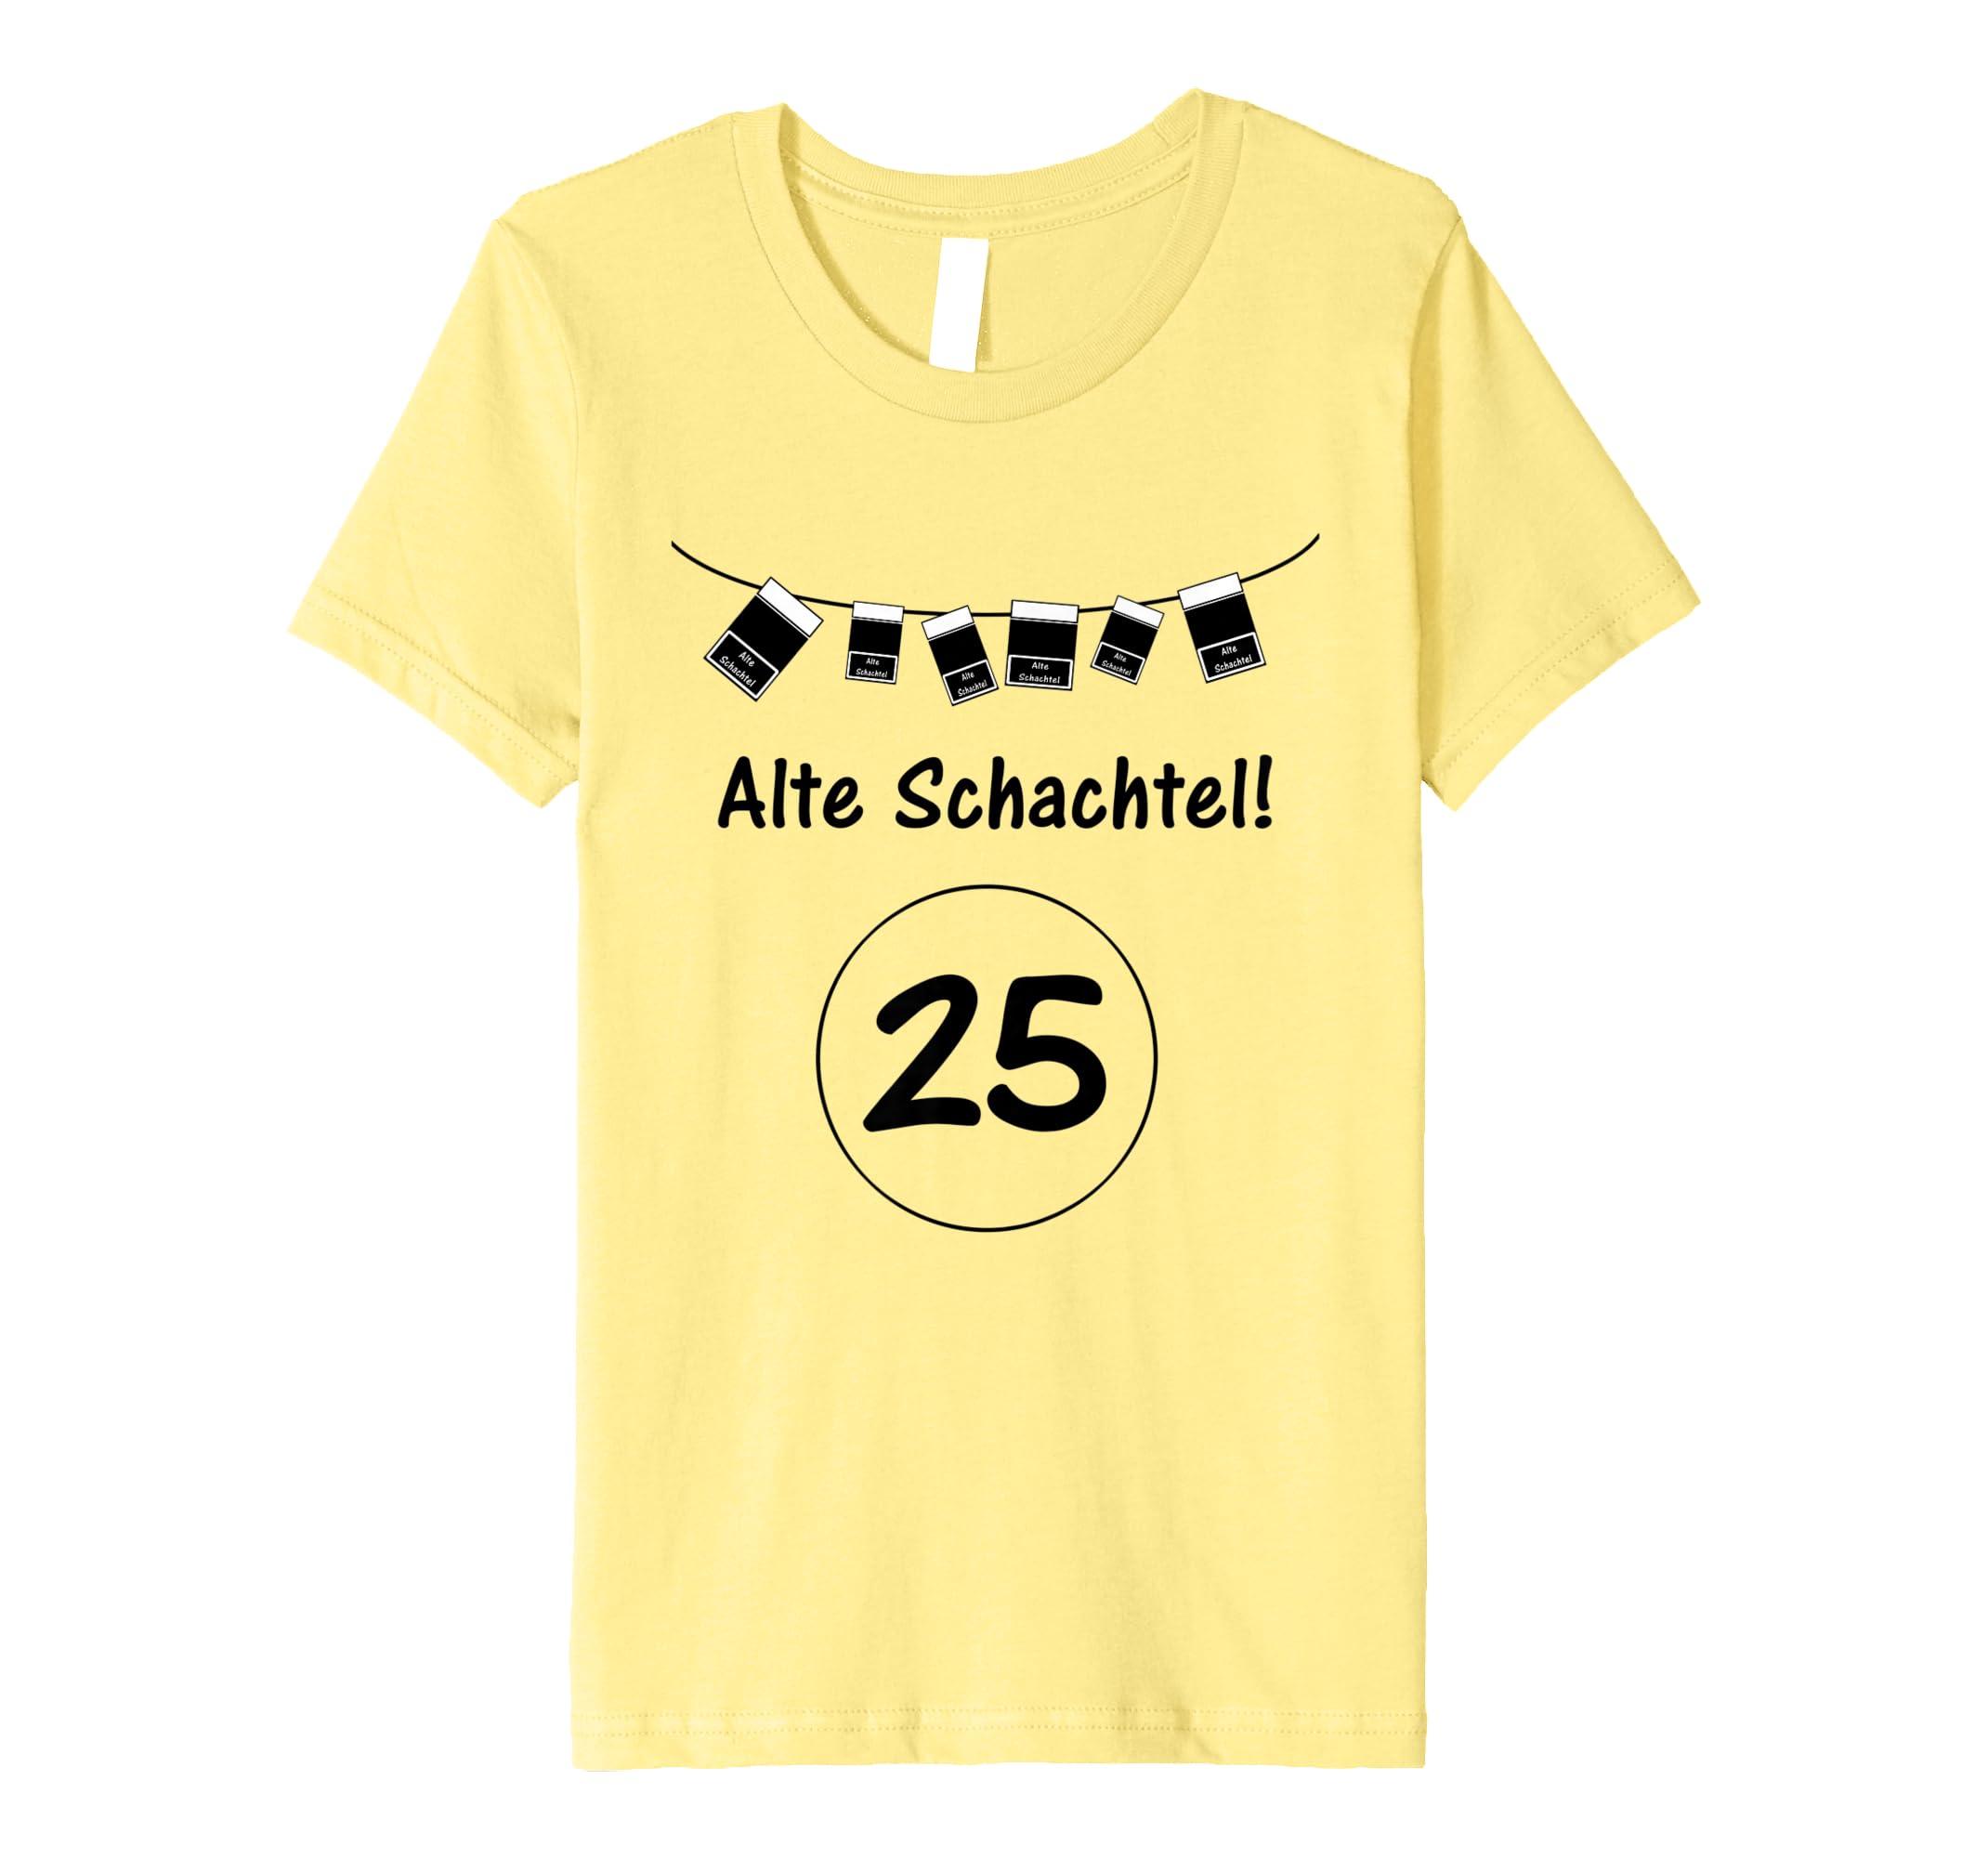 Alte Schachtel 25 Schachtelkranz T Shirt Zum Beschriften Amazonde